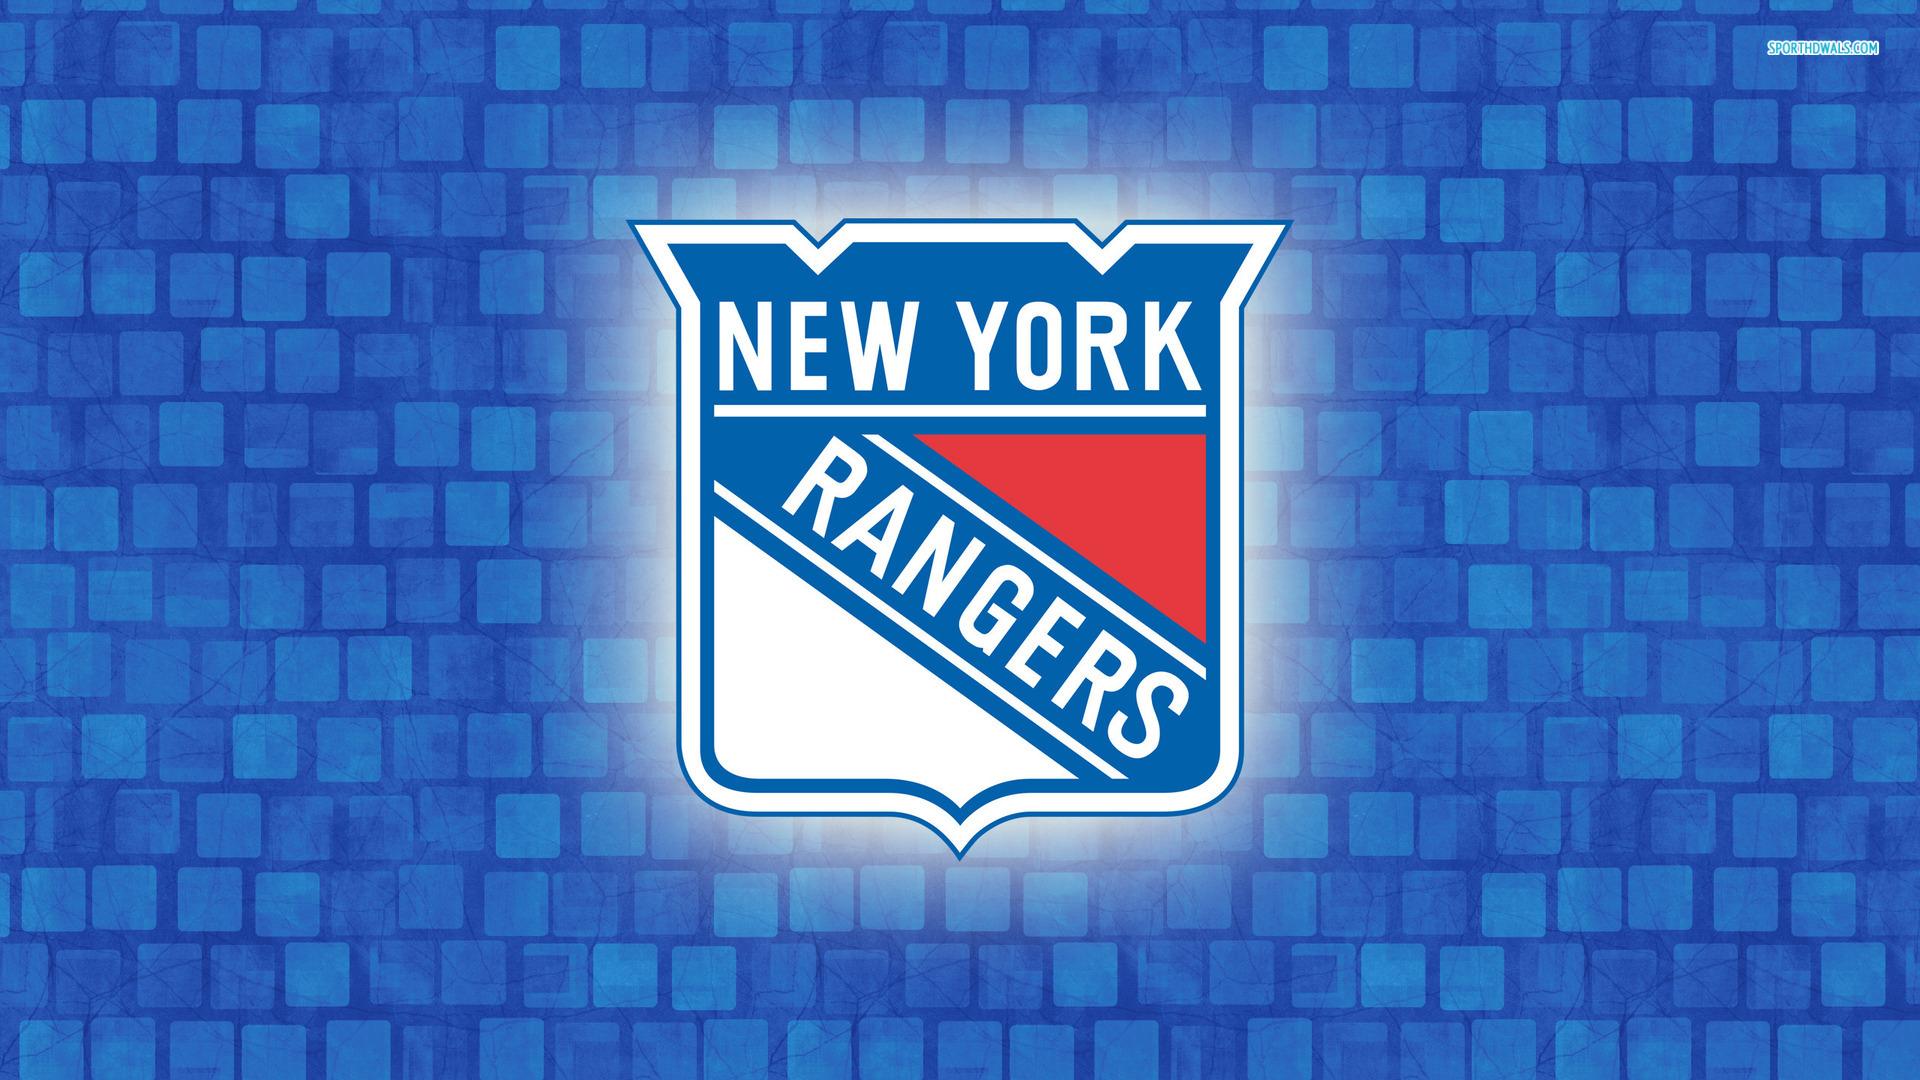 New York Rangers wallpaper | 1920x1080 | #54075